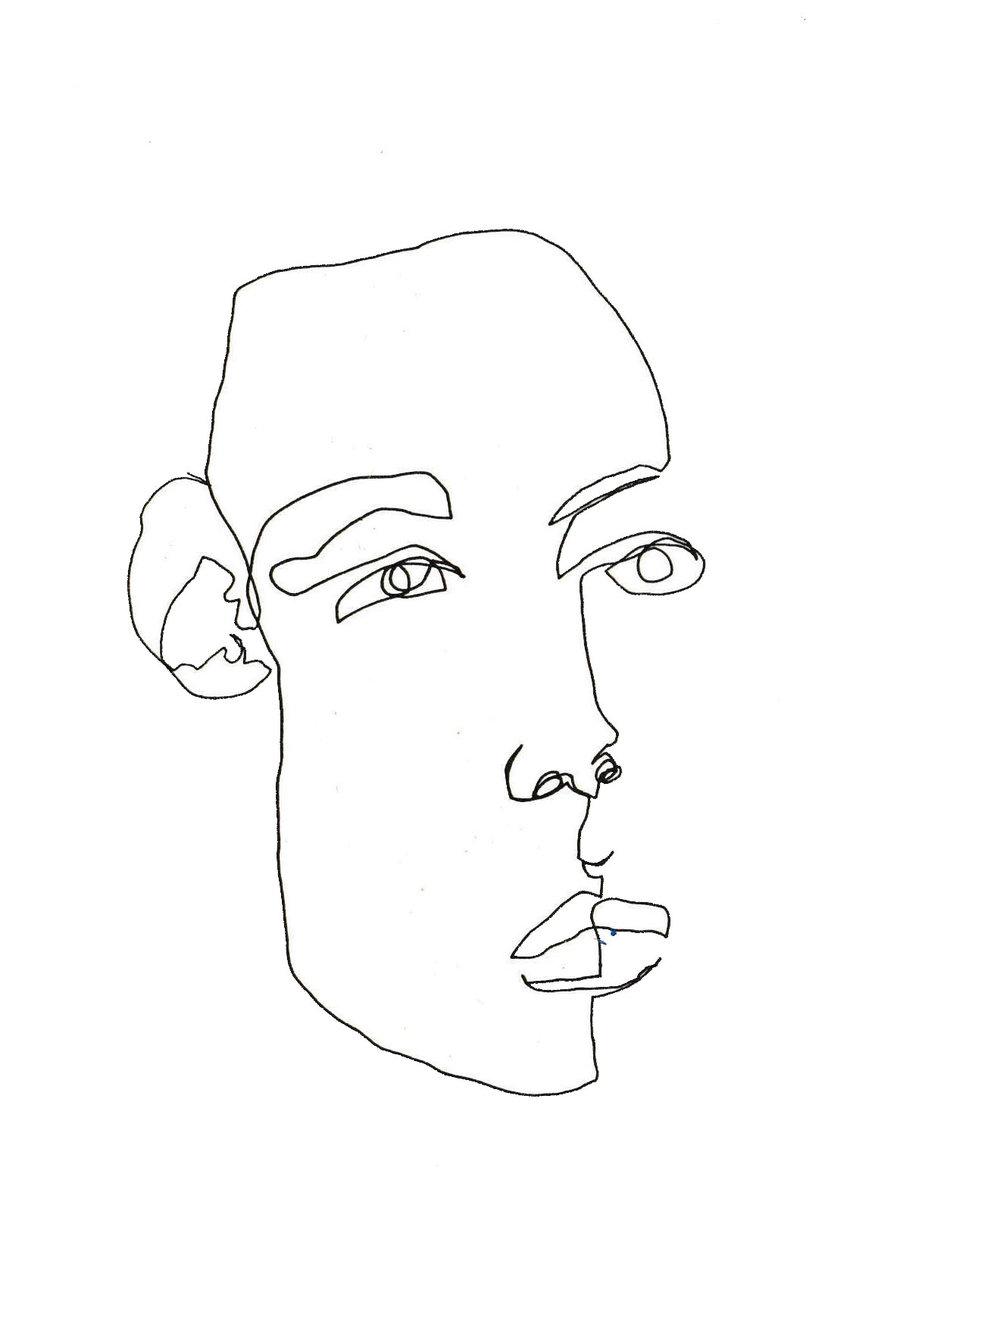 Contour Line Drawing Job : Blind contour line drawing february james